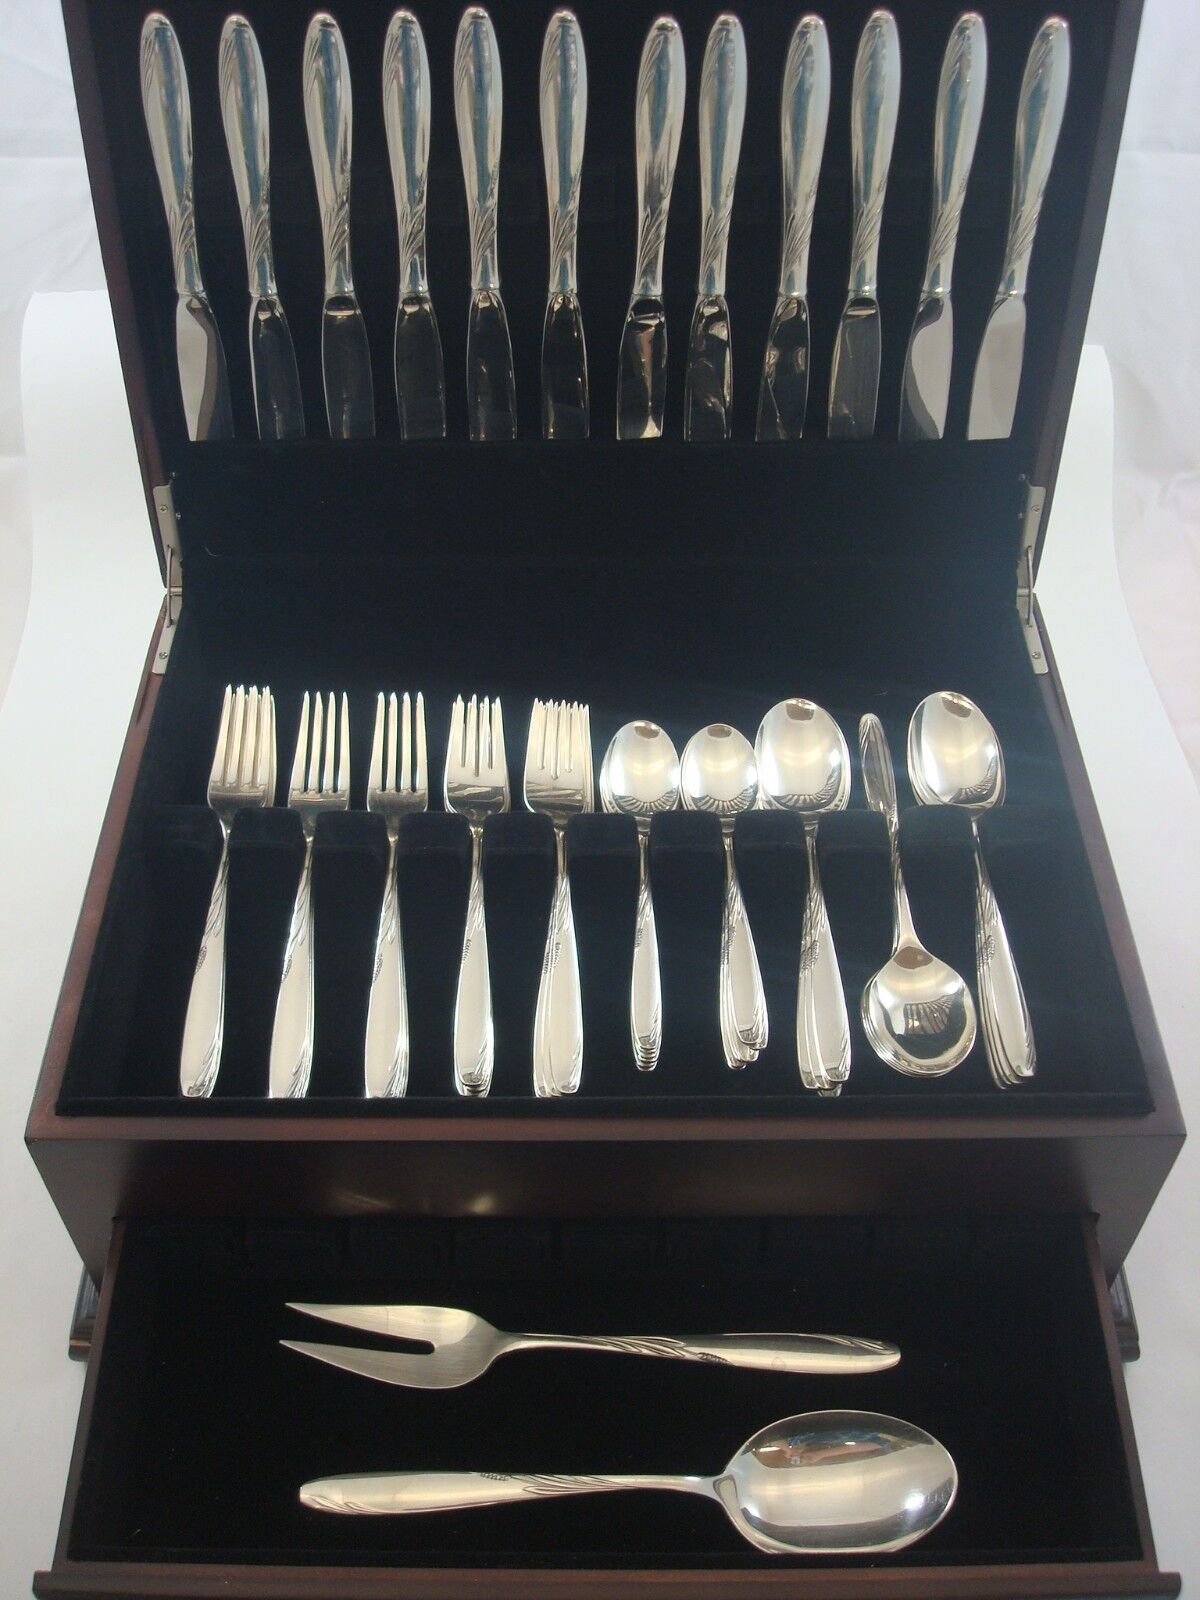 Gorham Willow Regular Fork Sterling Silver Flatware